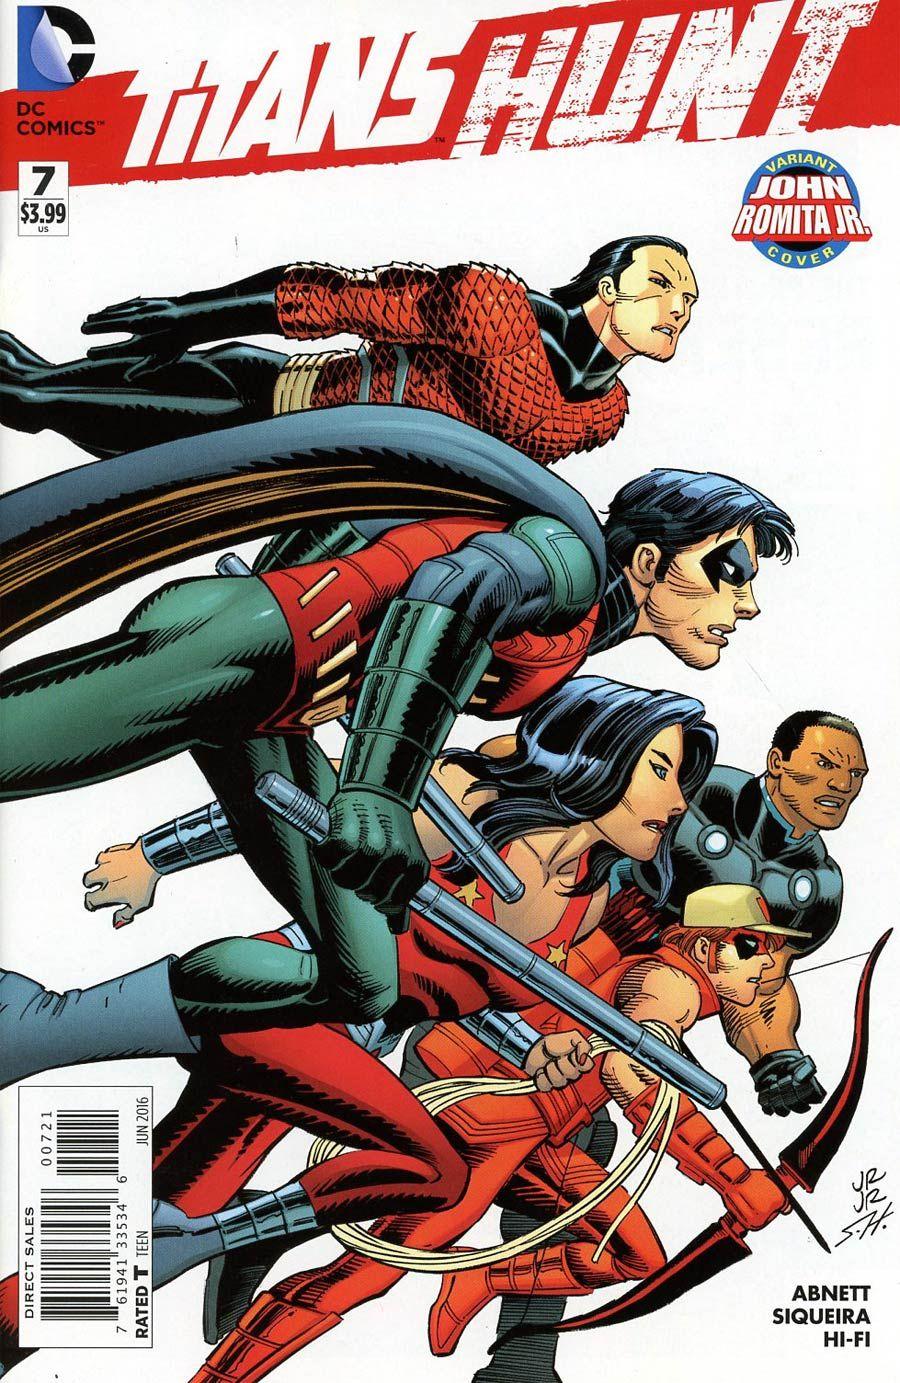 John persons comics for sale - Dc Comics April 2016 Theme Month Variant Covers Revealed John Romita Jr Comic Vine Visit To Grab An Amazing Super Hero Shirt Now On Sale